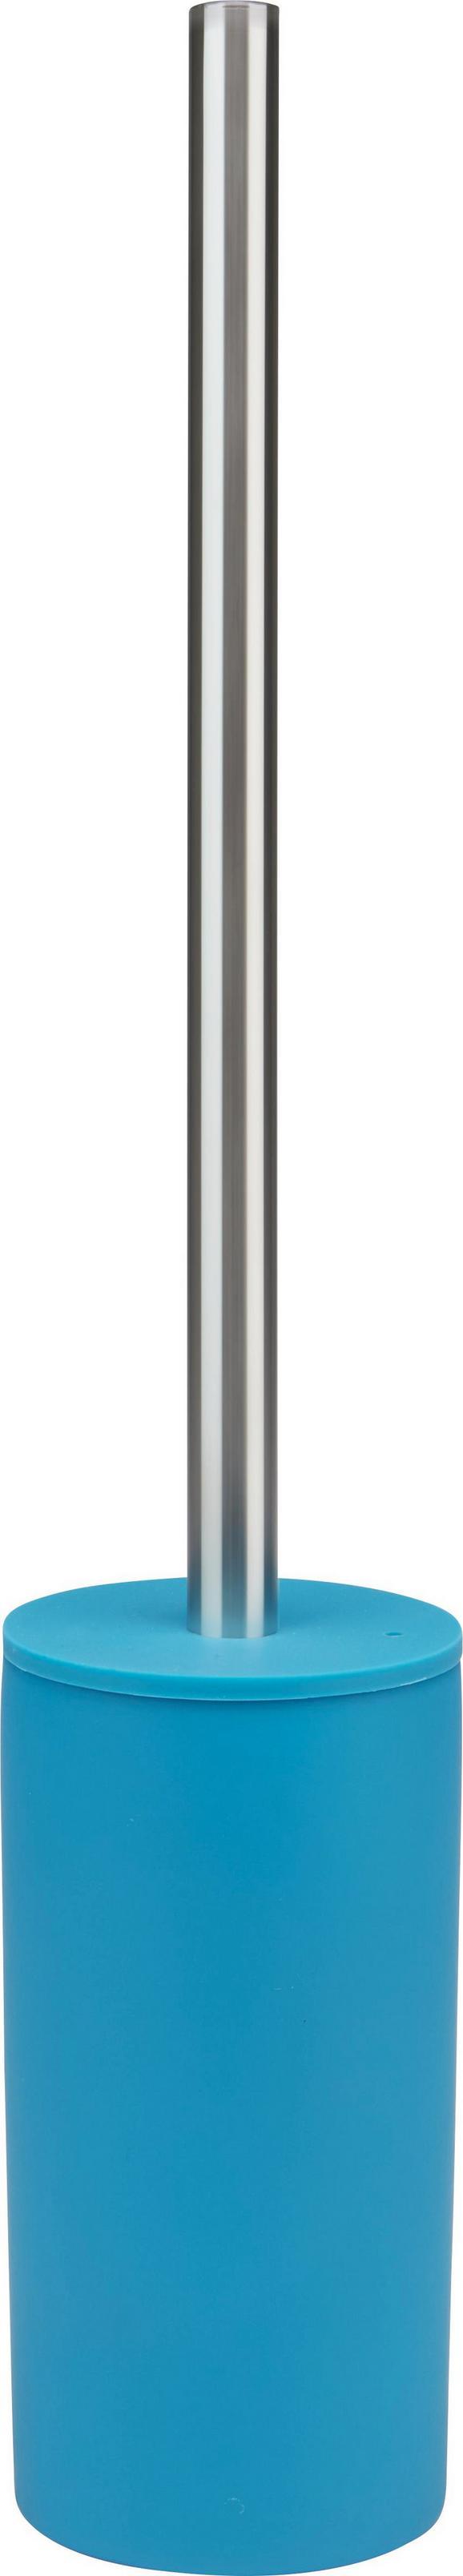 Wc-kefe Melanie - petrol, konvencionális, műanyag/fém (8/45cm) - MÖMAX modern living